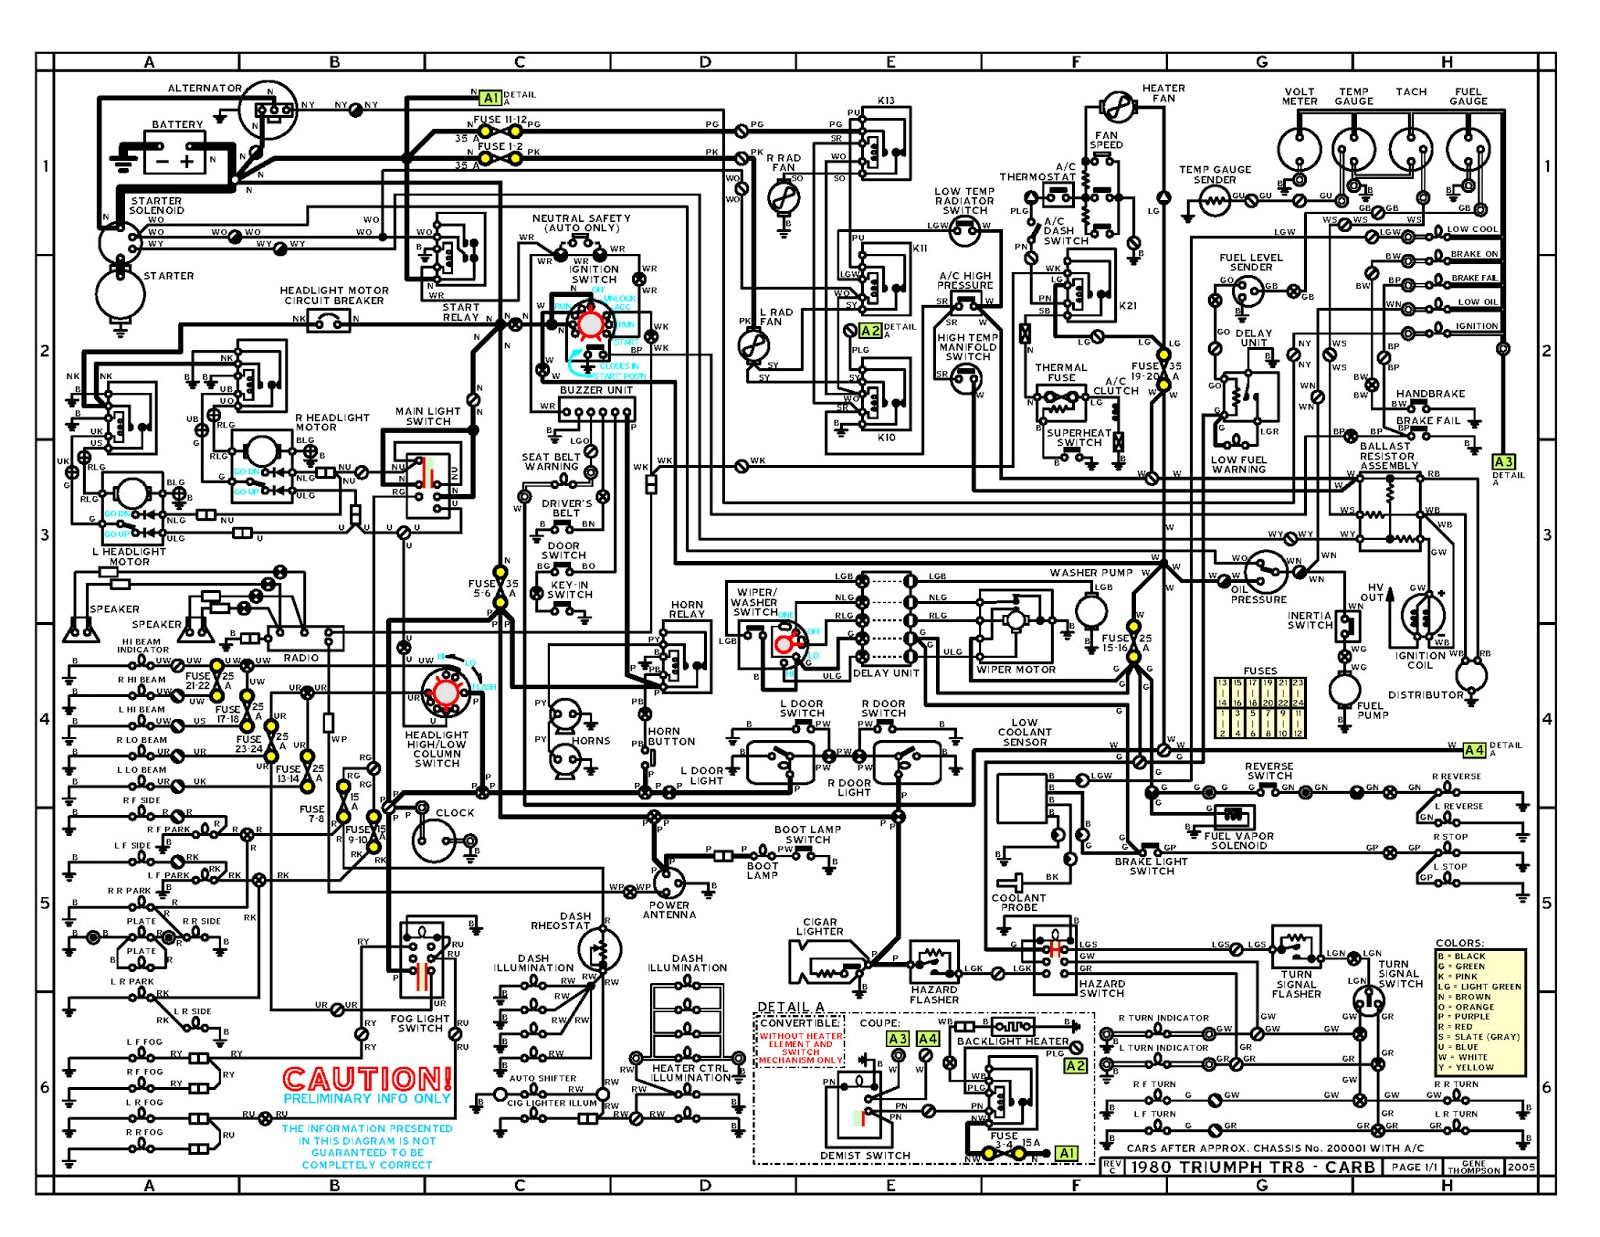 Dorable Electroluminescent Wire Schematics Vignette - Electrical ...